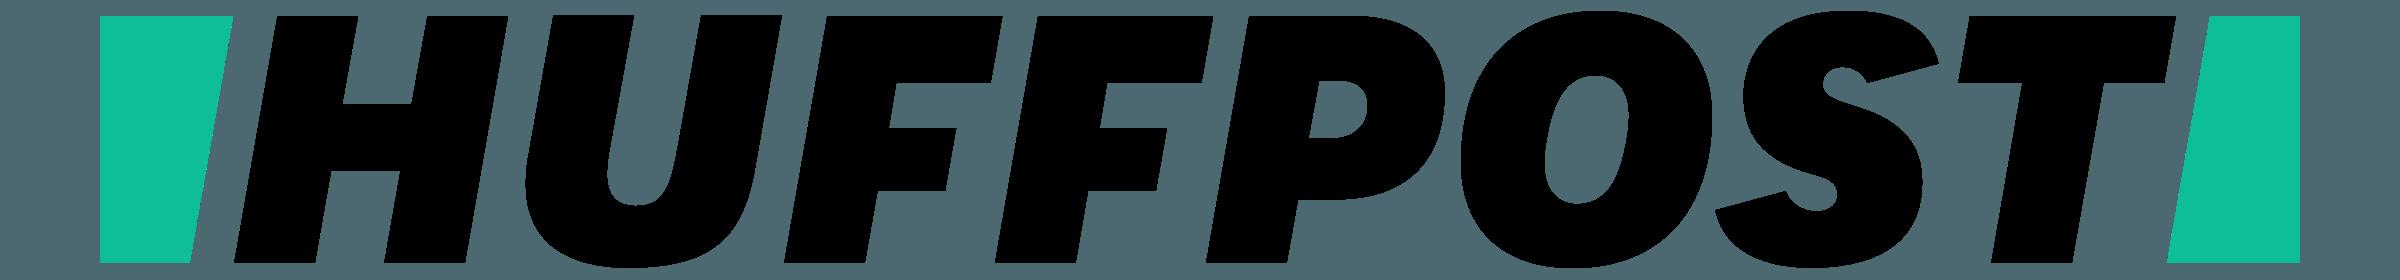 huffpost-logo-transparent